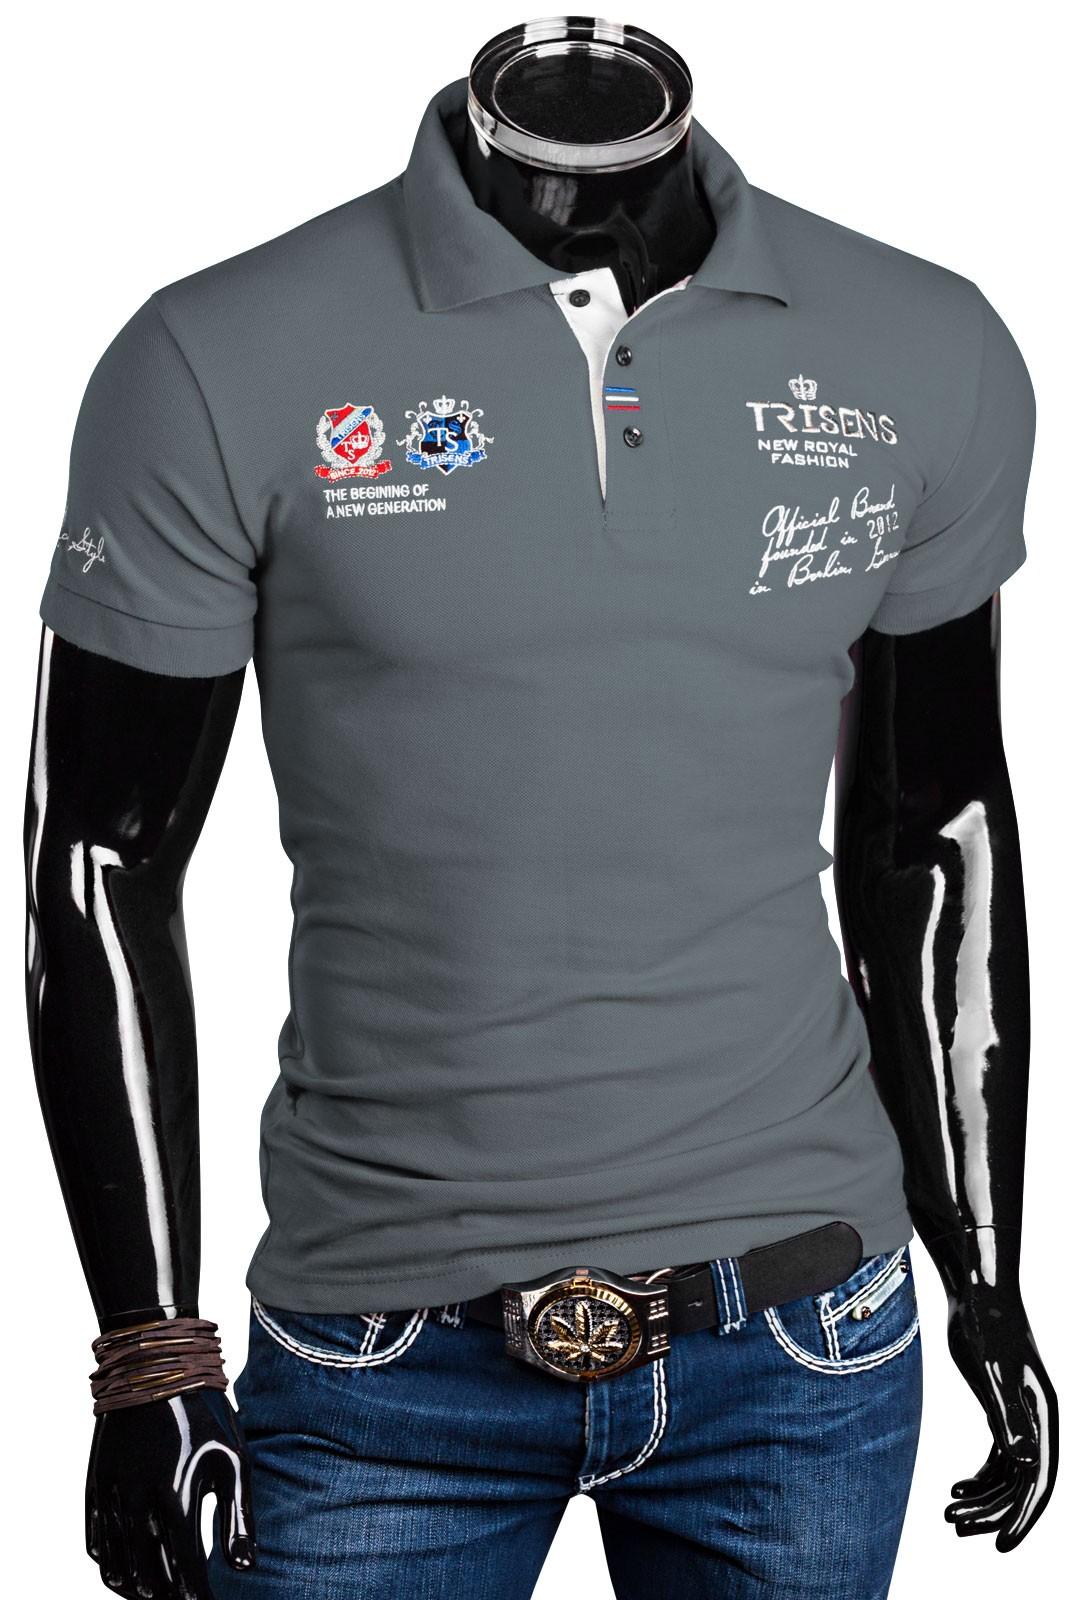 trisens herren polo shirt slim fit herren mode t shirts. Black Bedroom Furniture Sets. Home Design Ideas